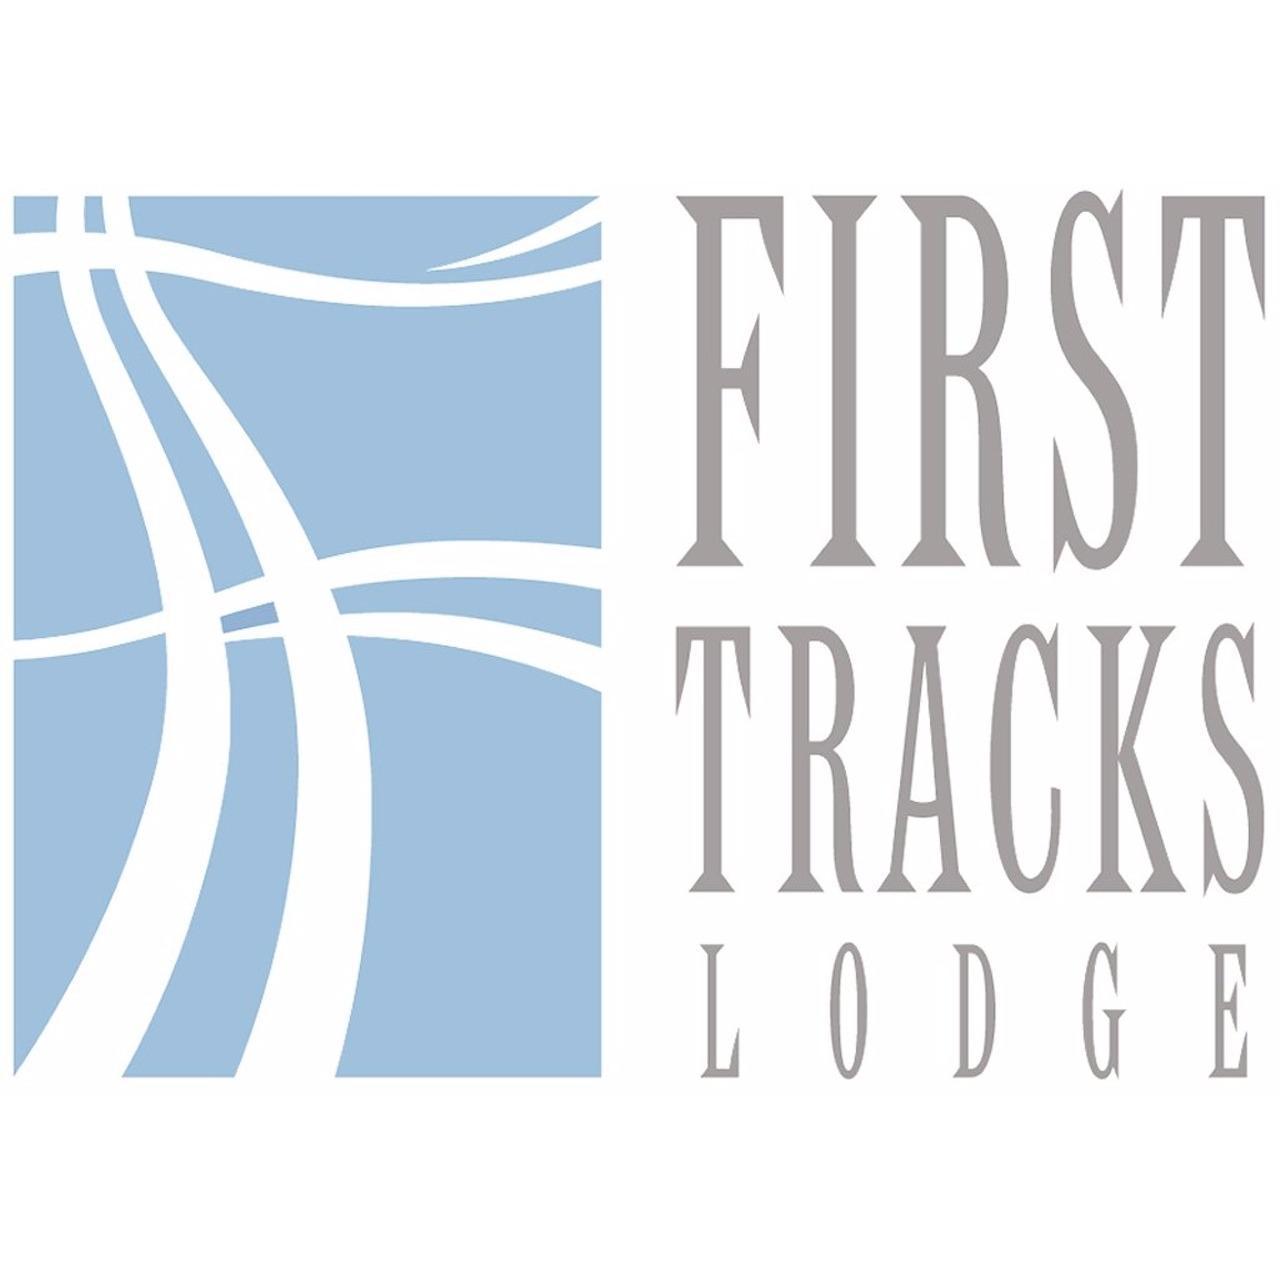 Condominium Complex in BC Whistler V0N 1B2 First Tracks Lodge 2036 London Lane  (604)938-9999